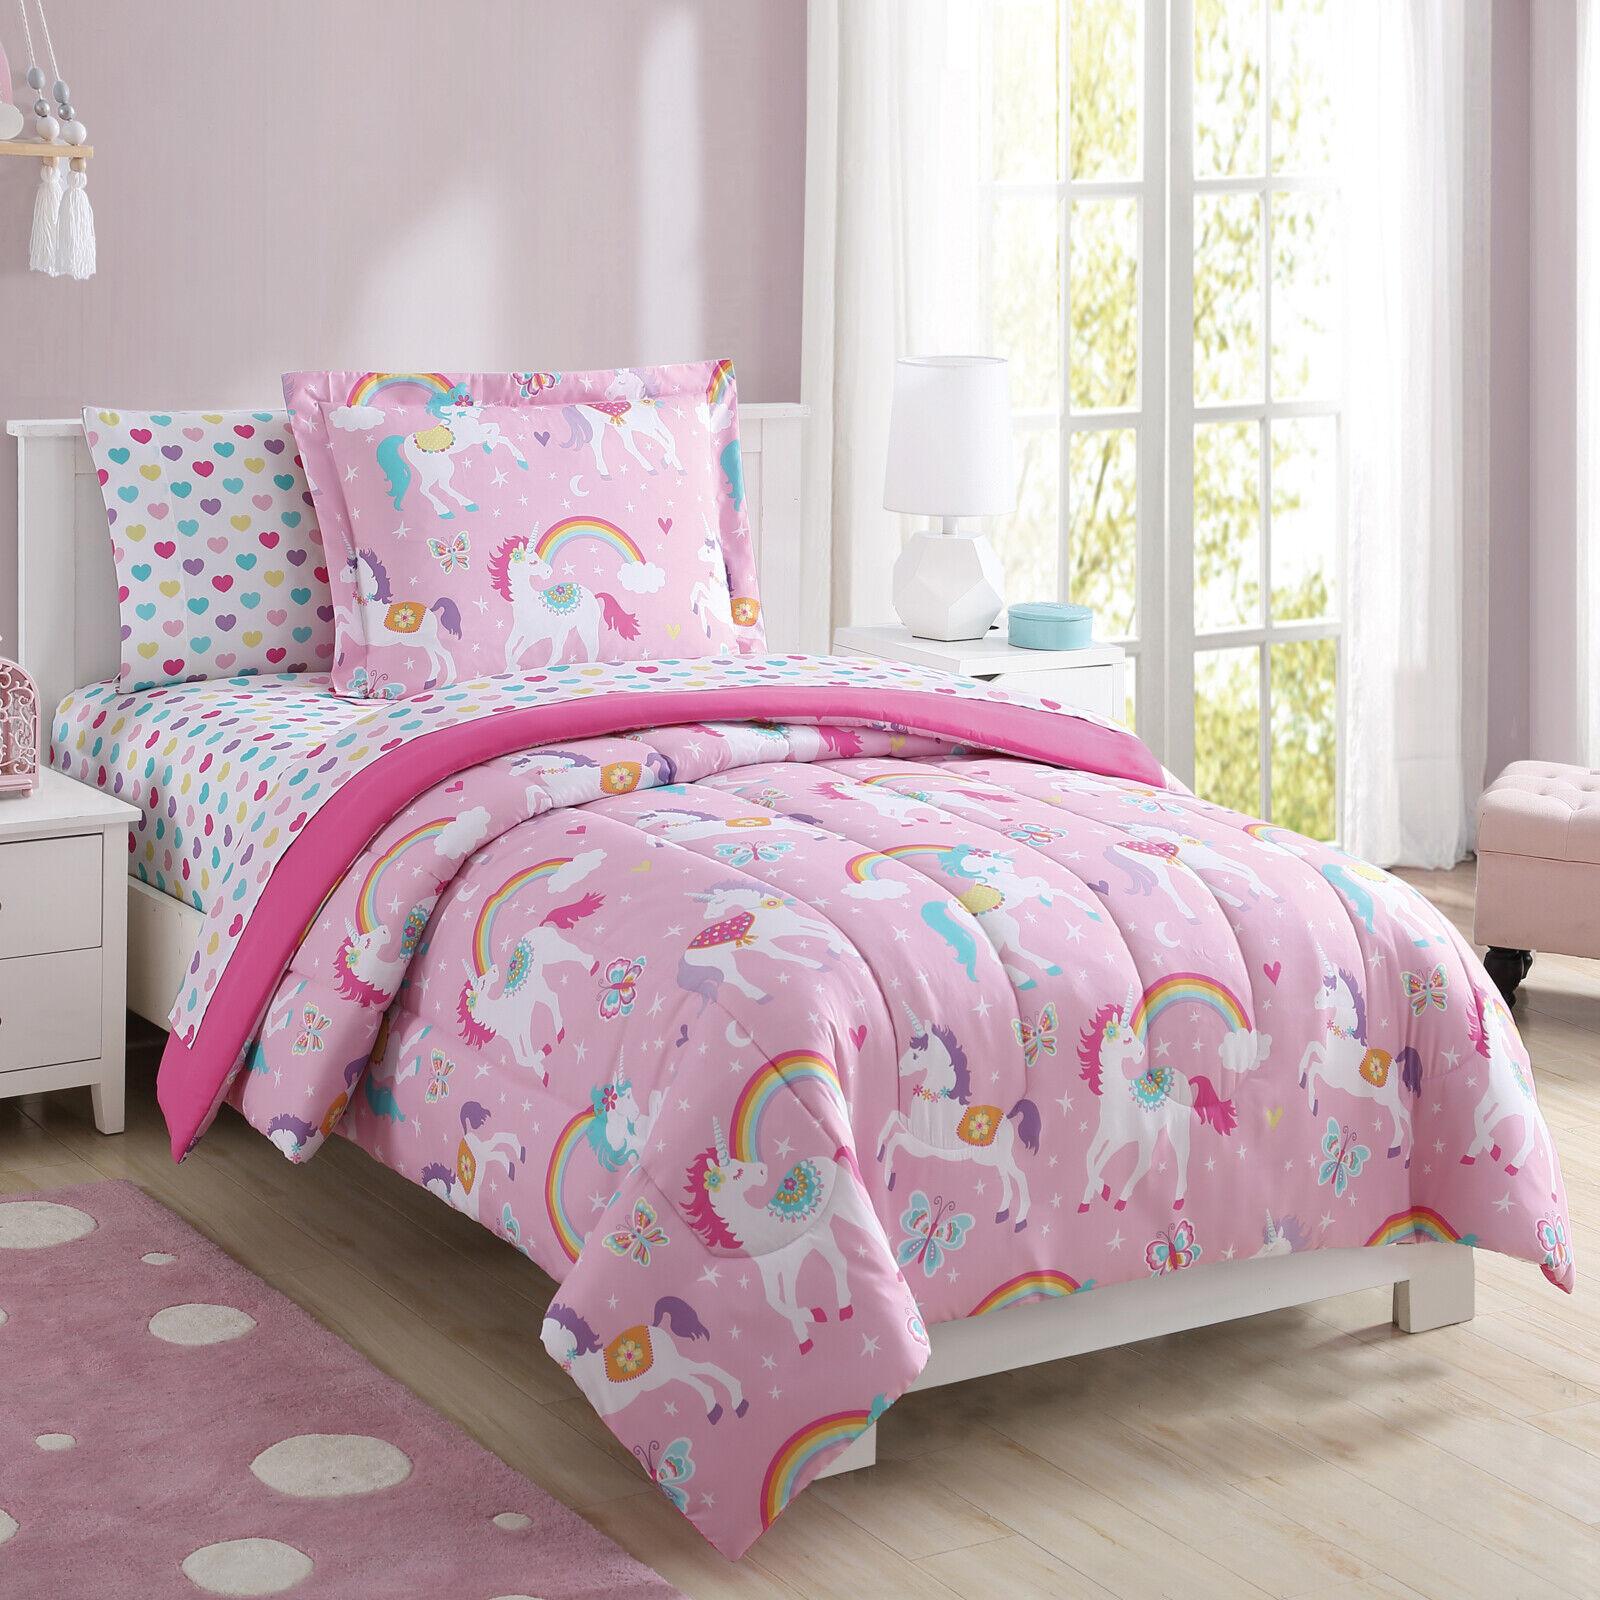 Bed In A Bag Bedding Set Kids Girls Bedroom Decor Rainbow Unicorn Full Size New 81806396658 Ebay